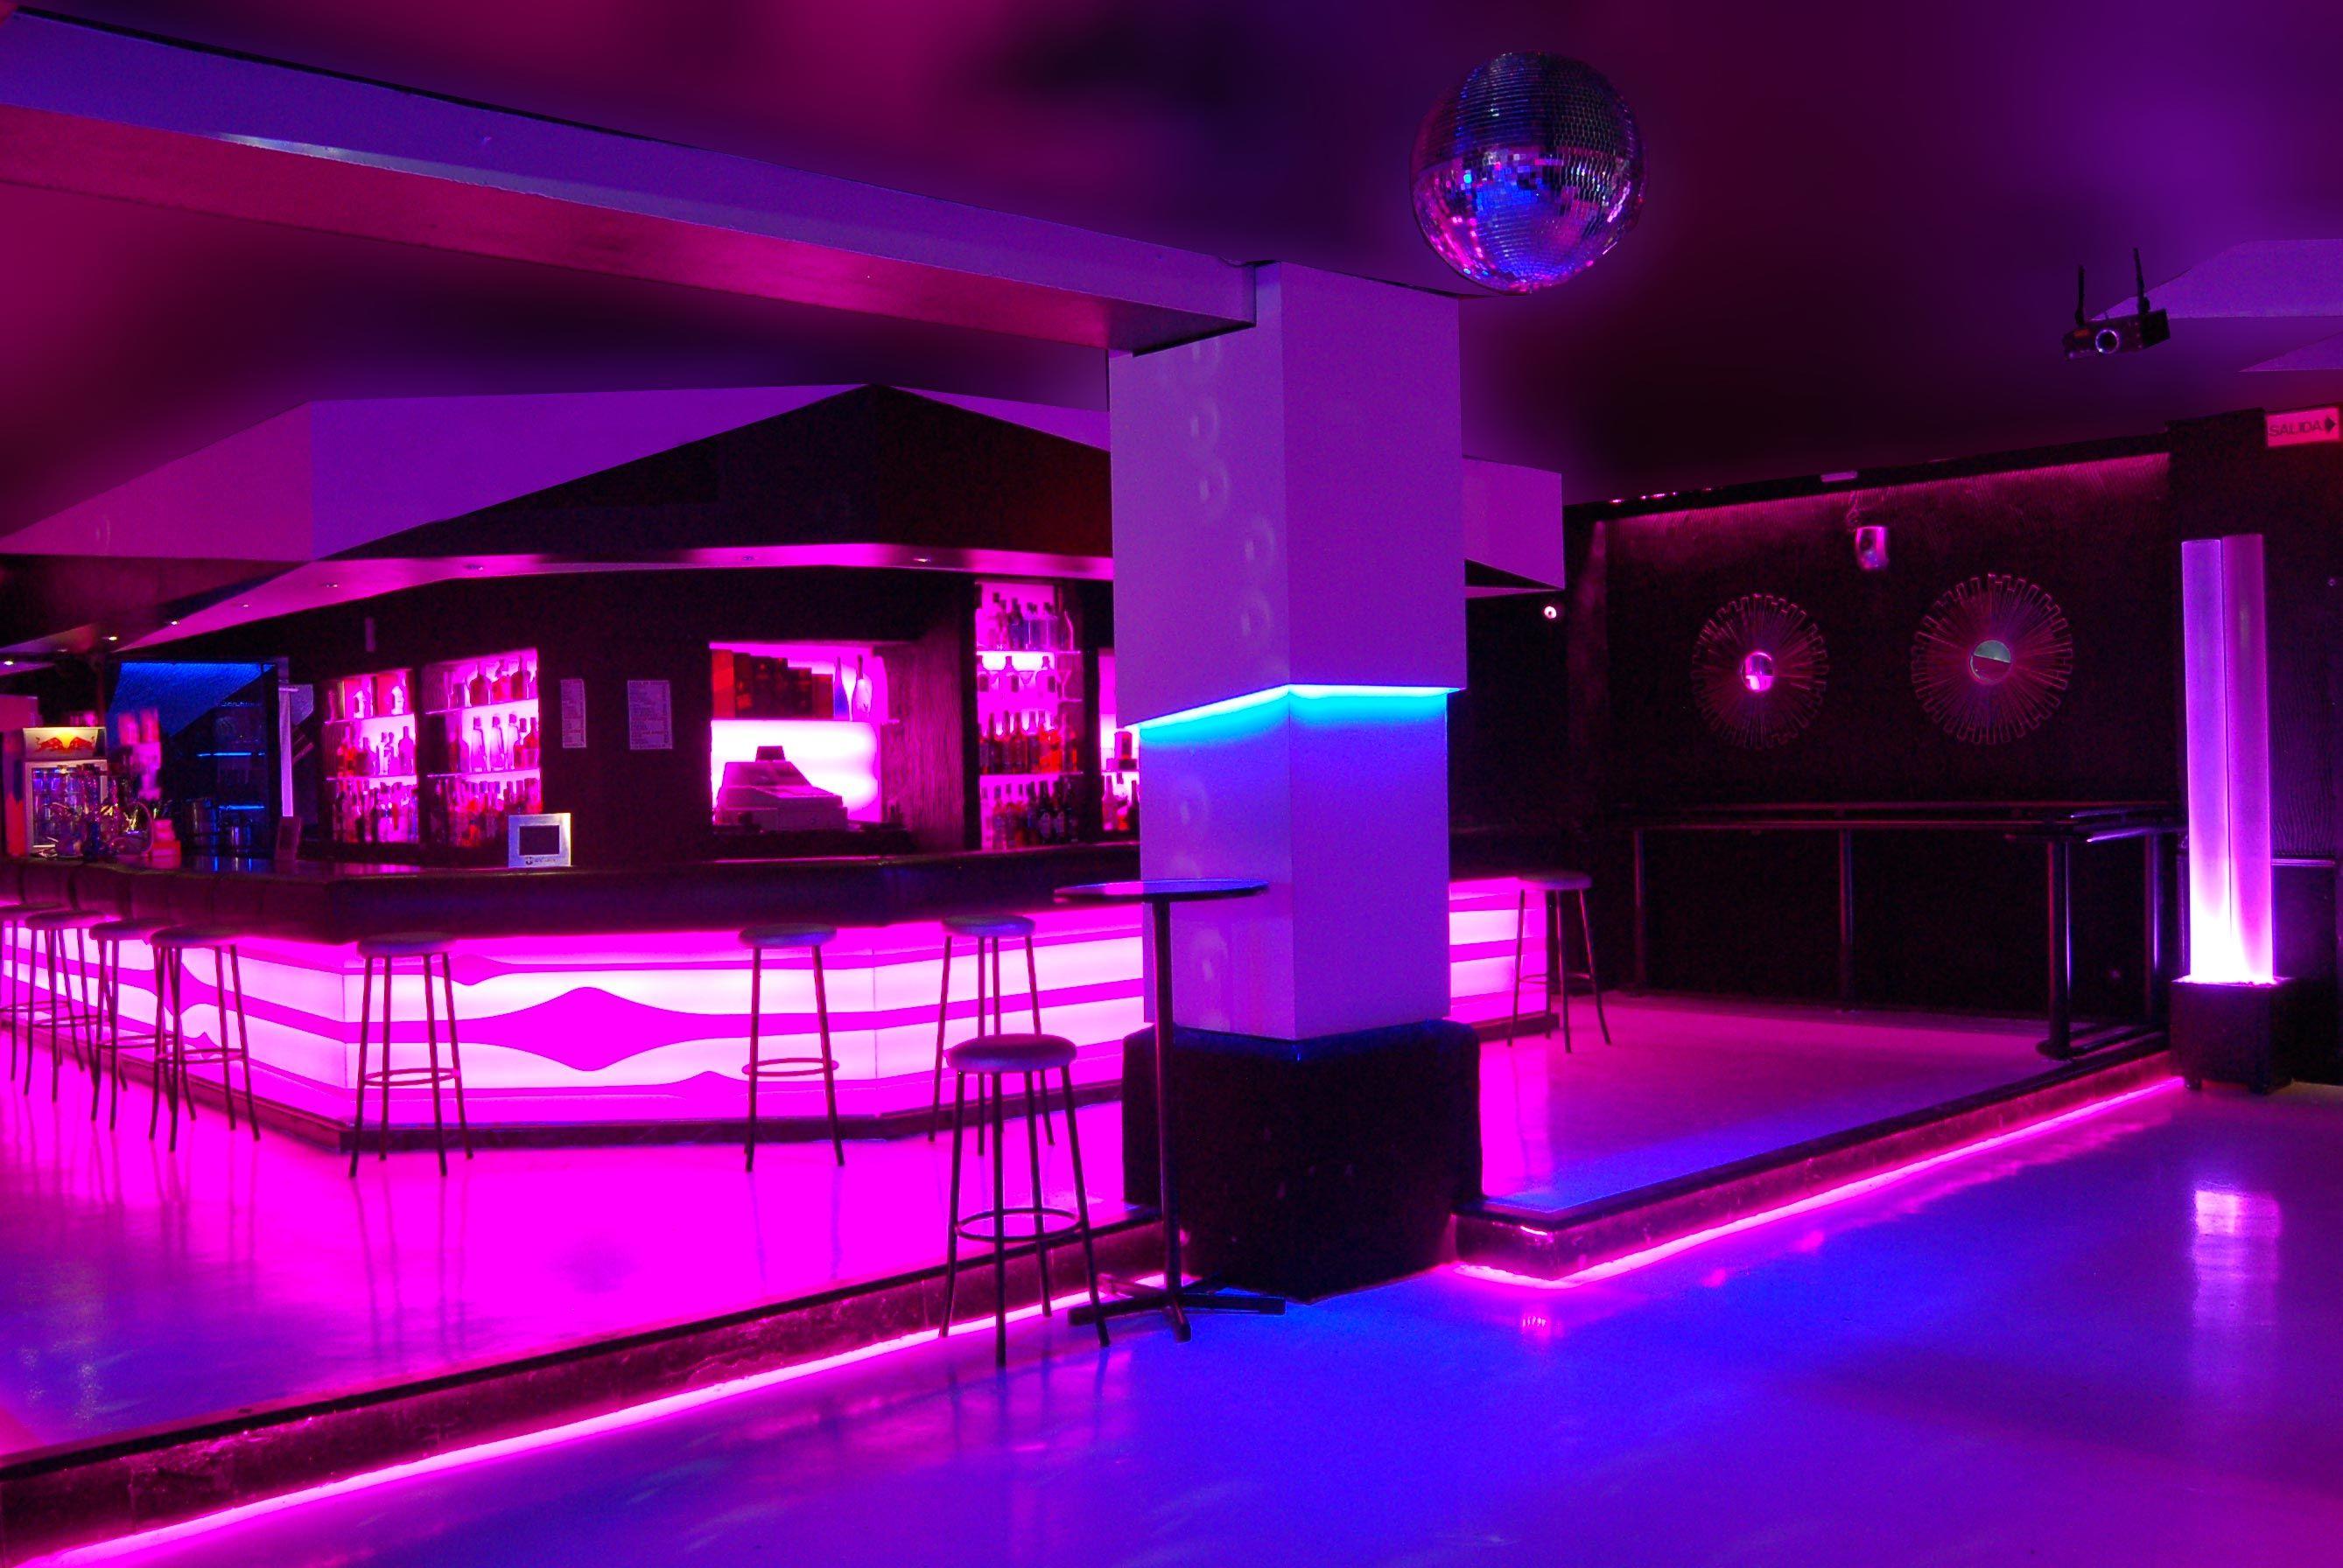 Night club interior design silvan francisco discoteca ozona vip in ilminacion - Discoteca ozona madrid ...